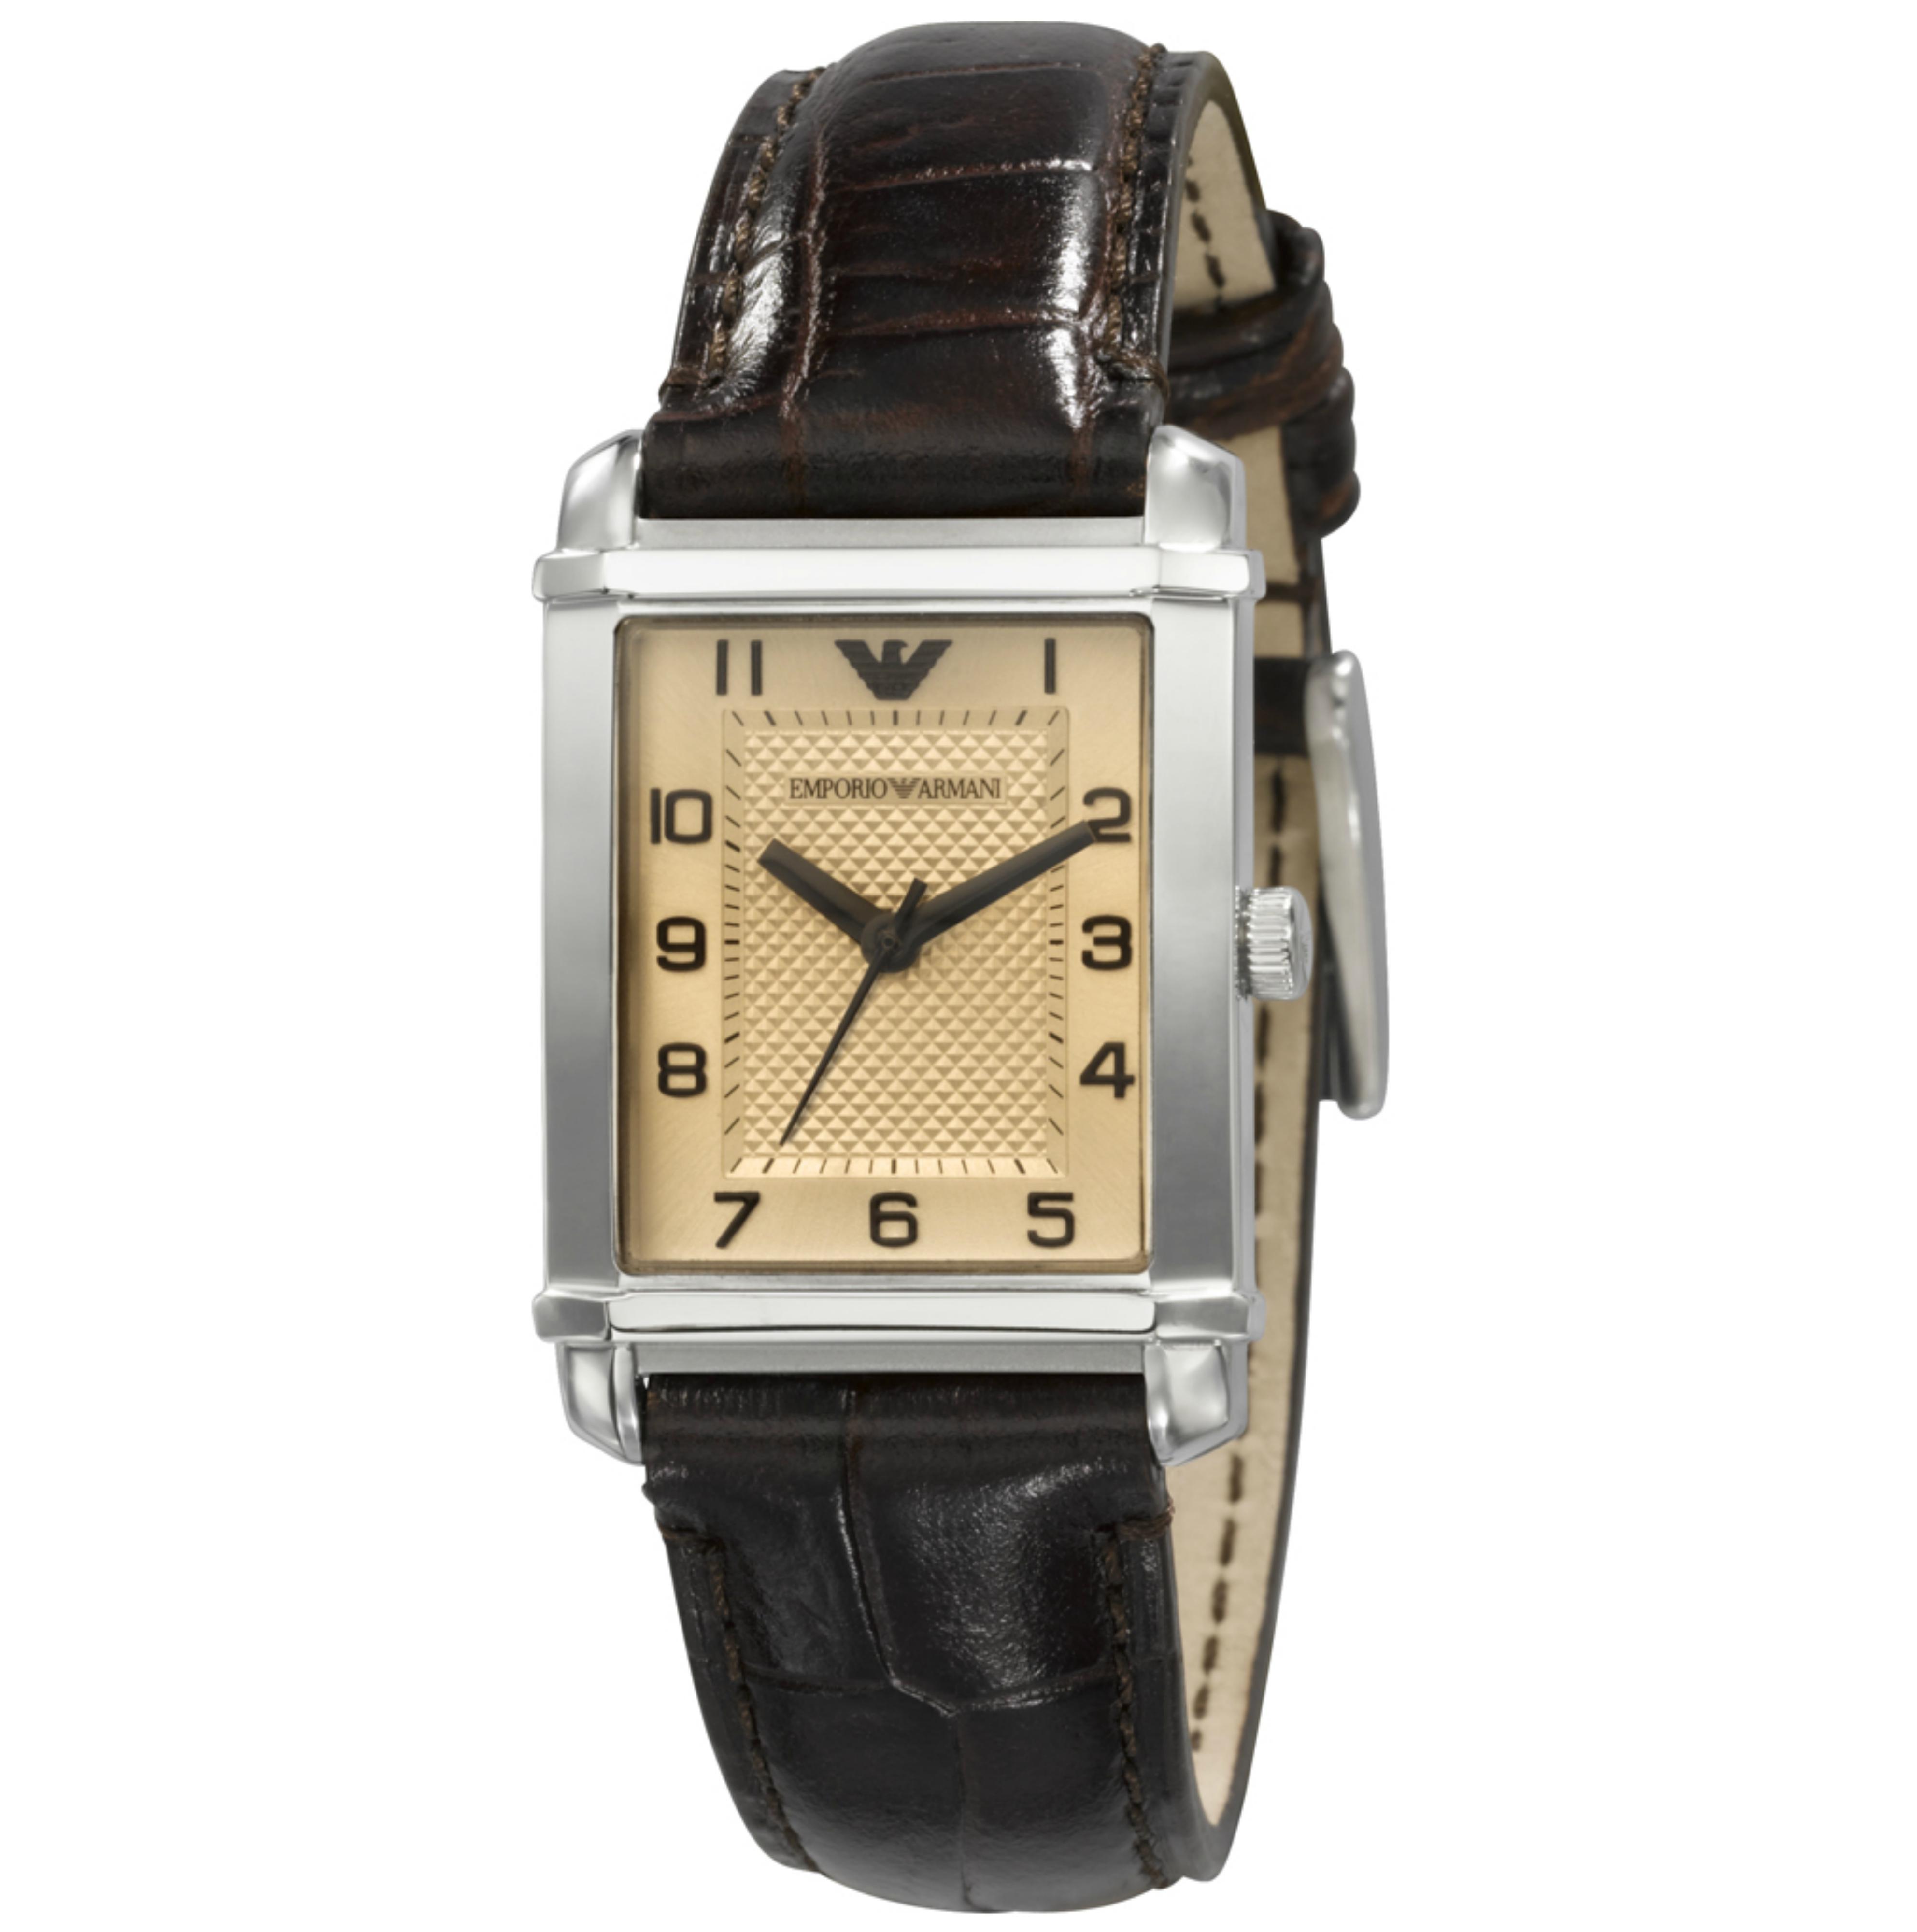 Emporio Armani Marco Small Women's Brown Leather Strap Analog Wrist Watch AR0491